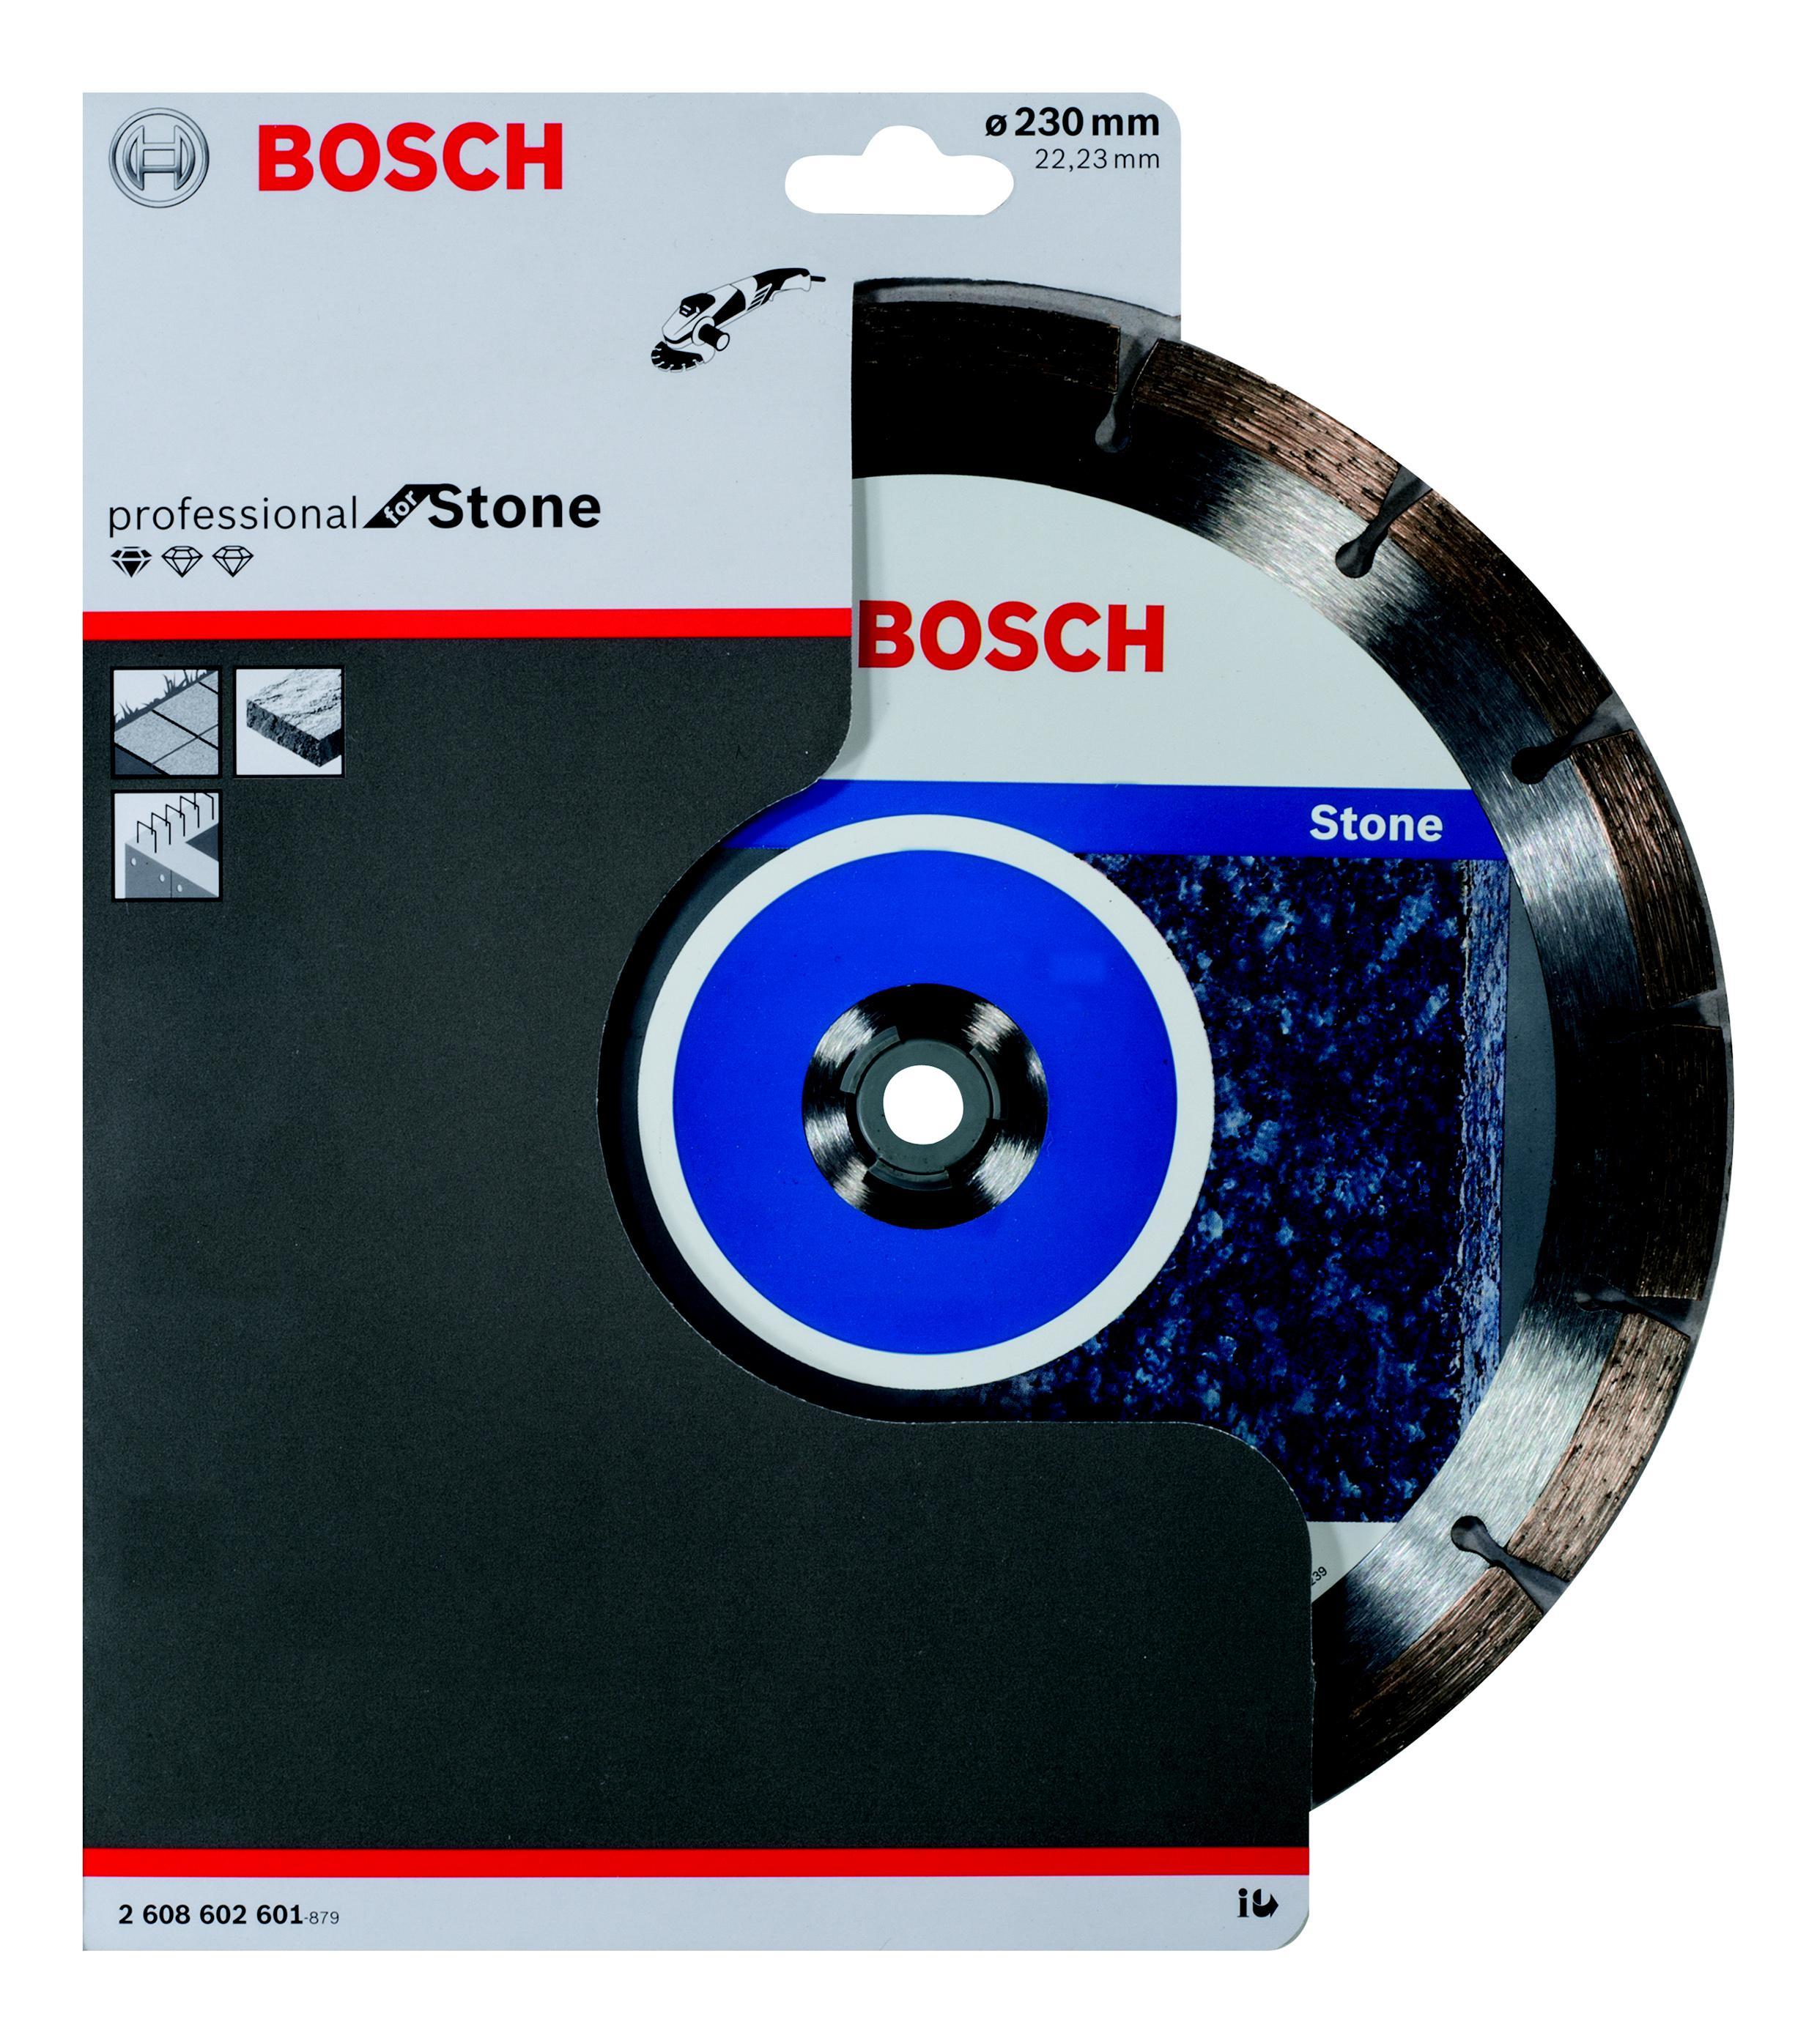 Круг алмазный Bosch Standard for stone 230x22 сегмент (2.608.602.601) шлифовальная машина bosch gss 230 ave professional